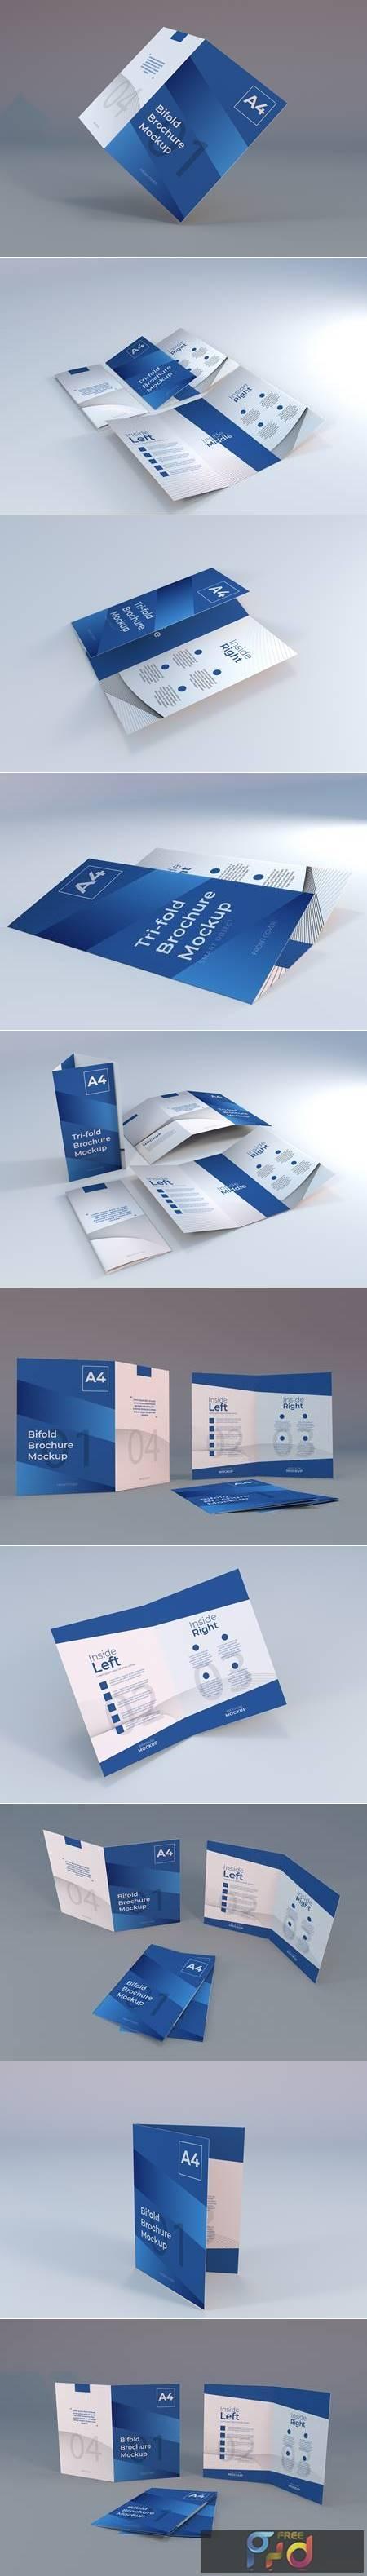 Realistic a4 bifold brochure paper mockup 1